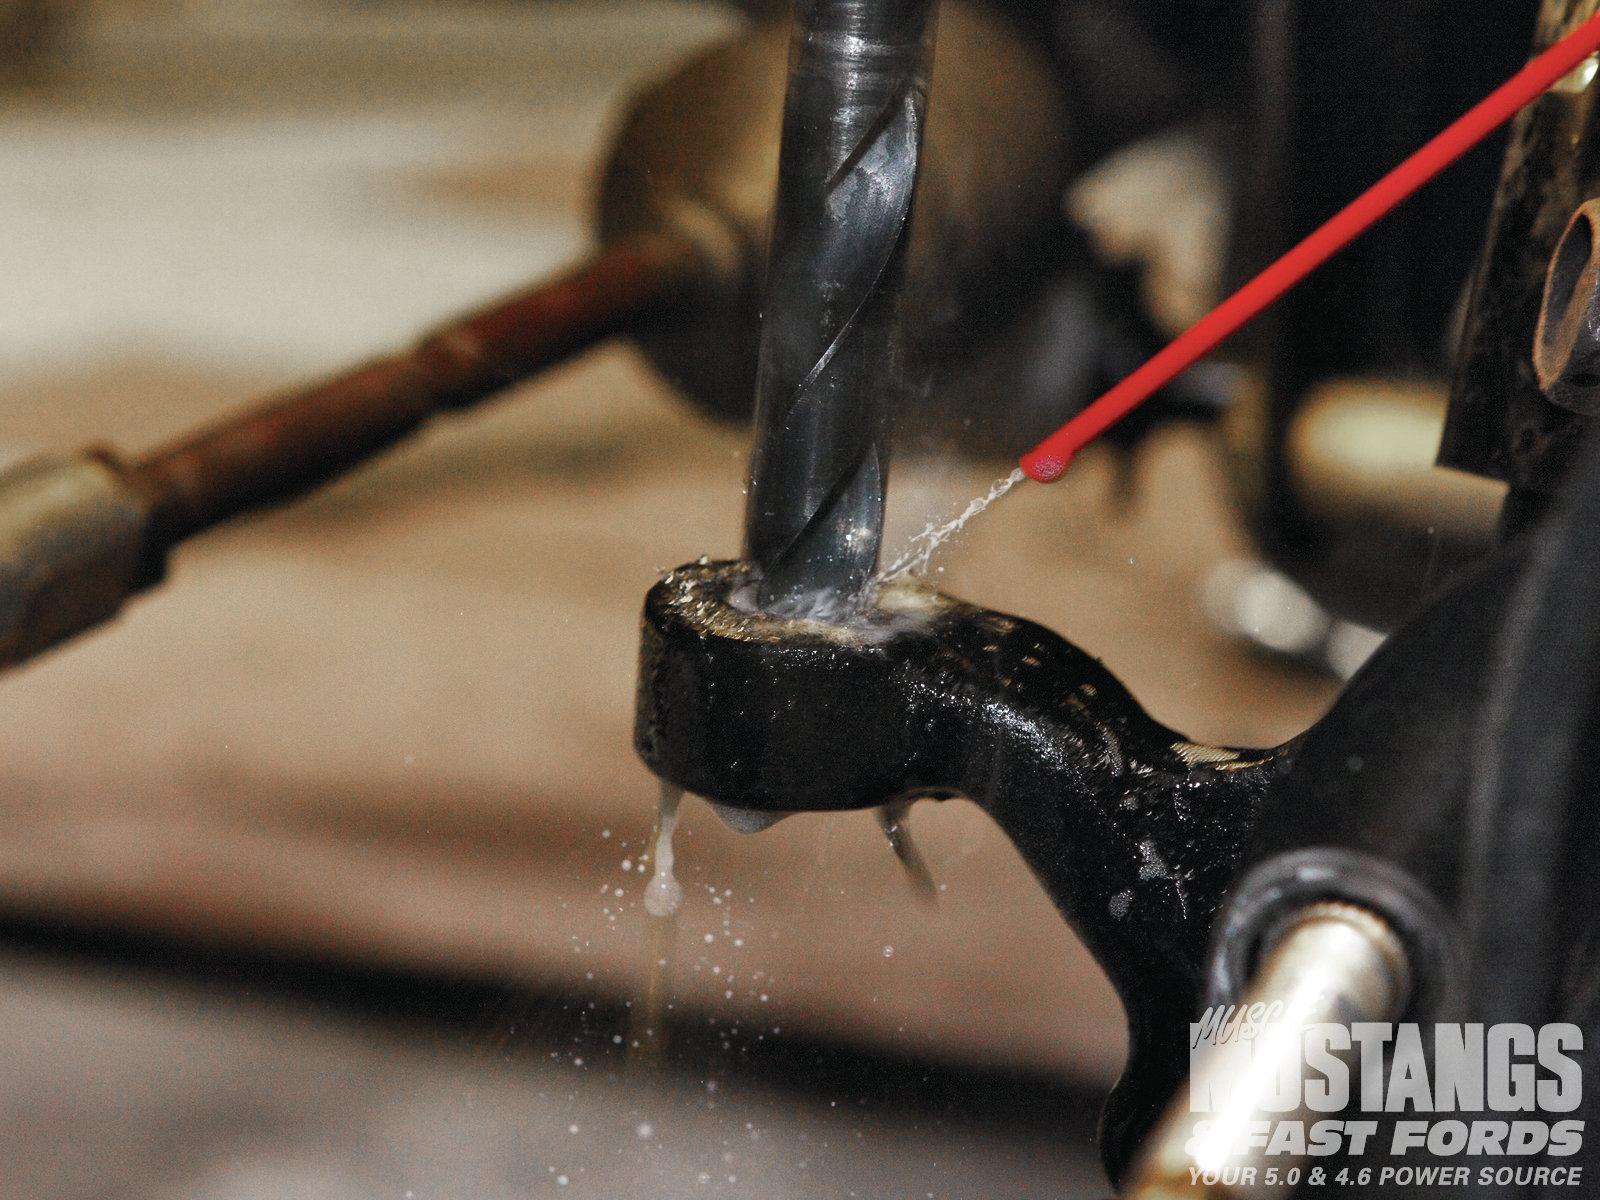 Mmfp 1110 Tech Ss4 Drag Spec Braking System Draggin The Brakes 008